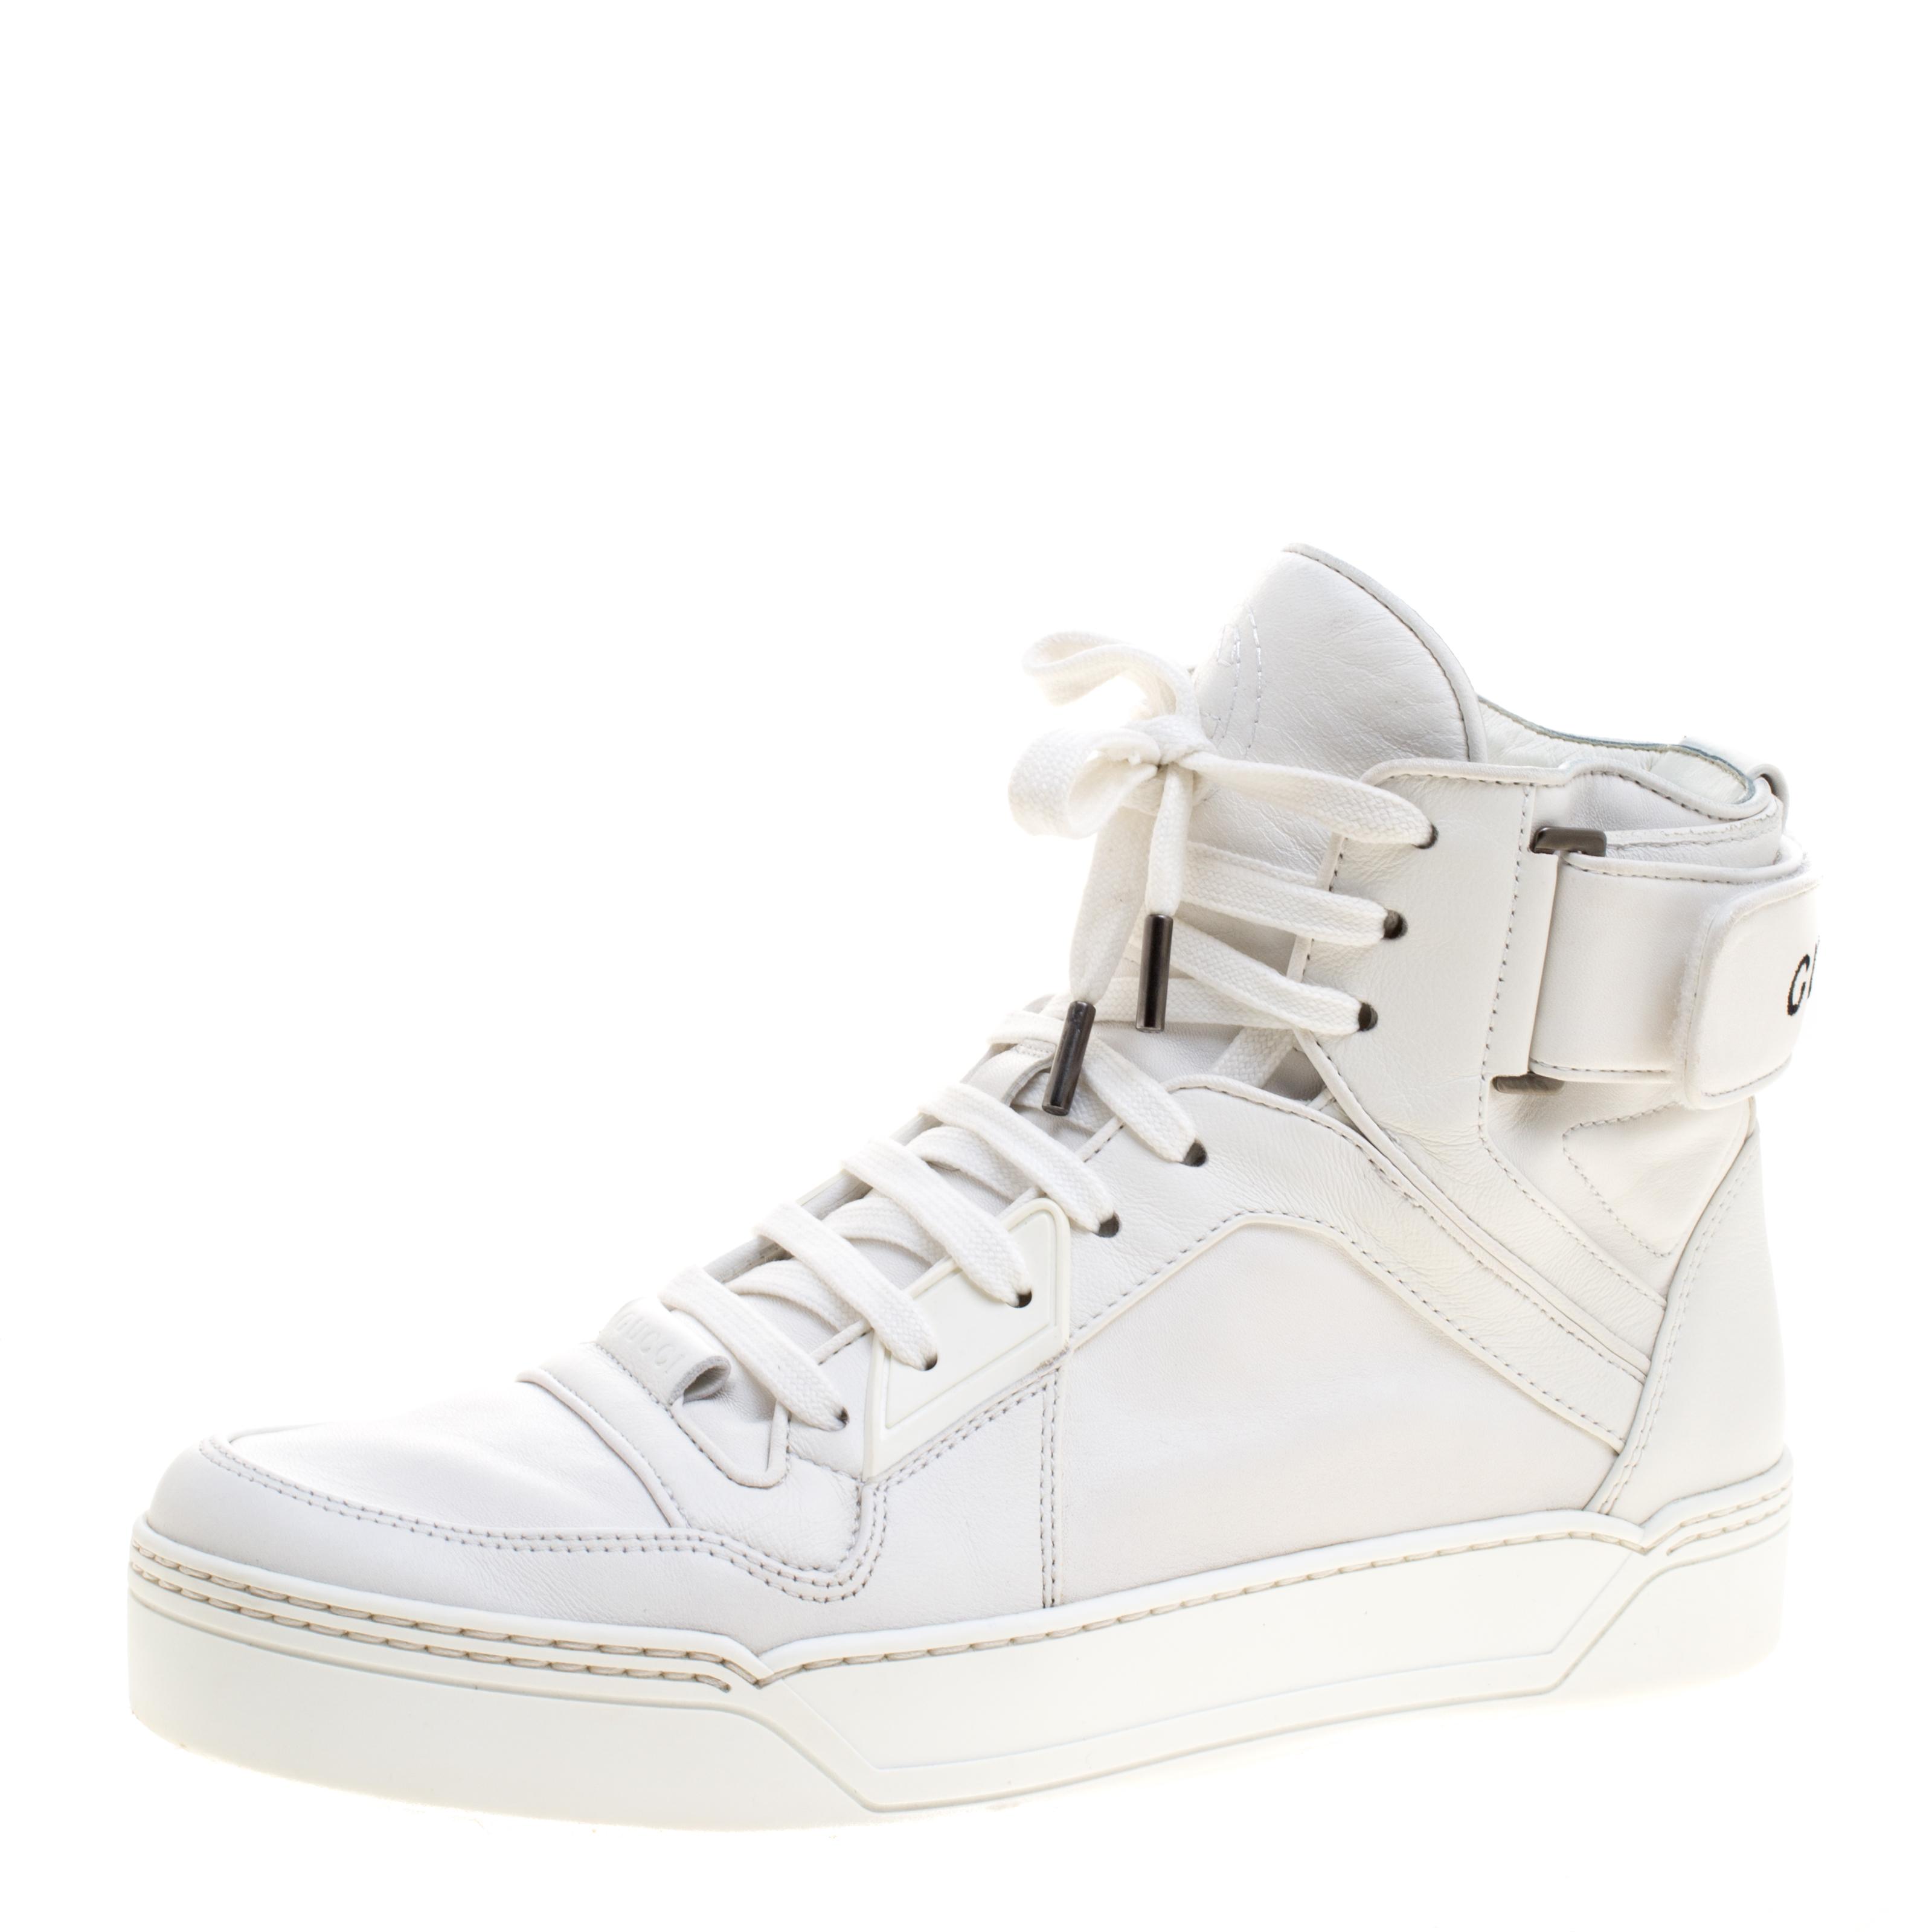 880226e5fa015 ... Gucci White Leather New Basketball High Top Sneakers Size 41.5.  nextprev. prevnext